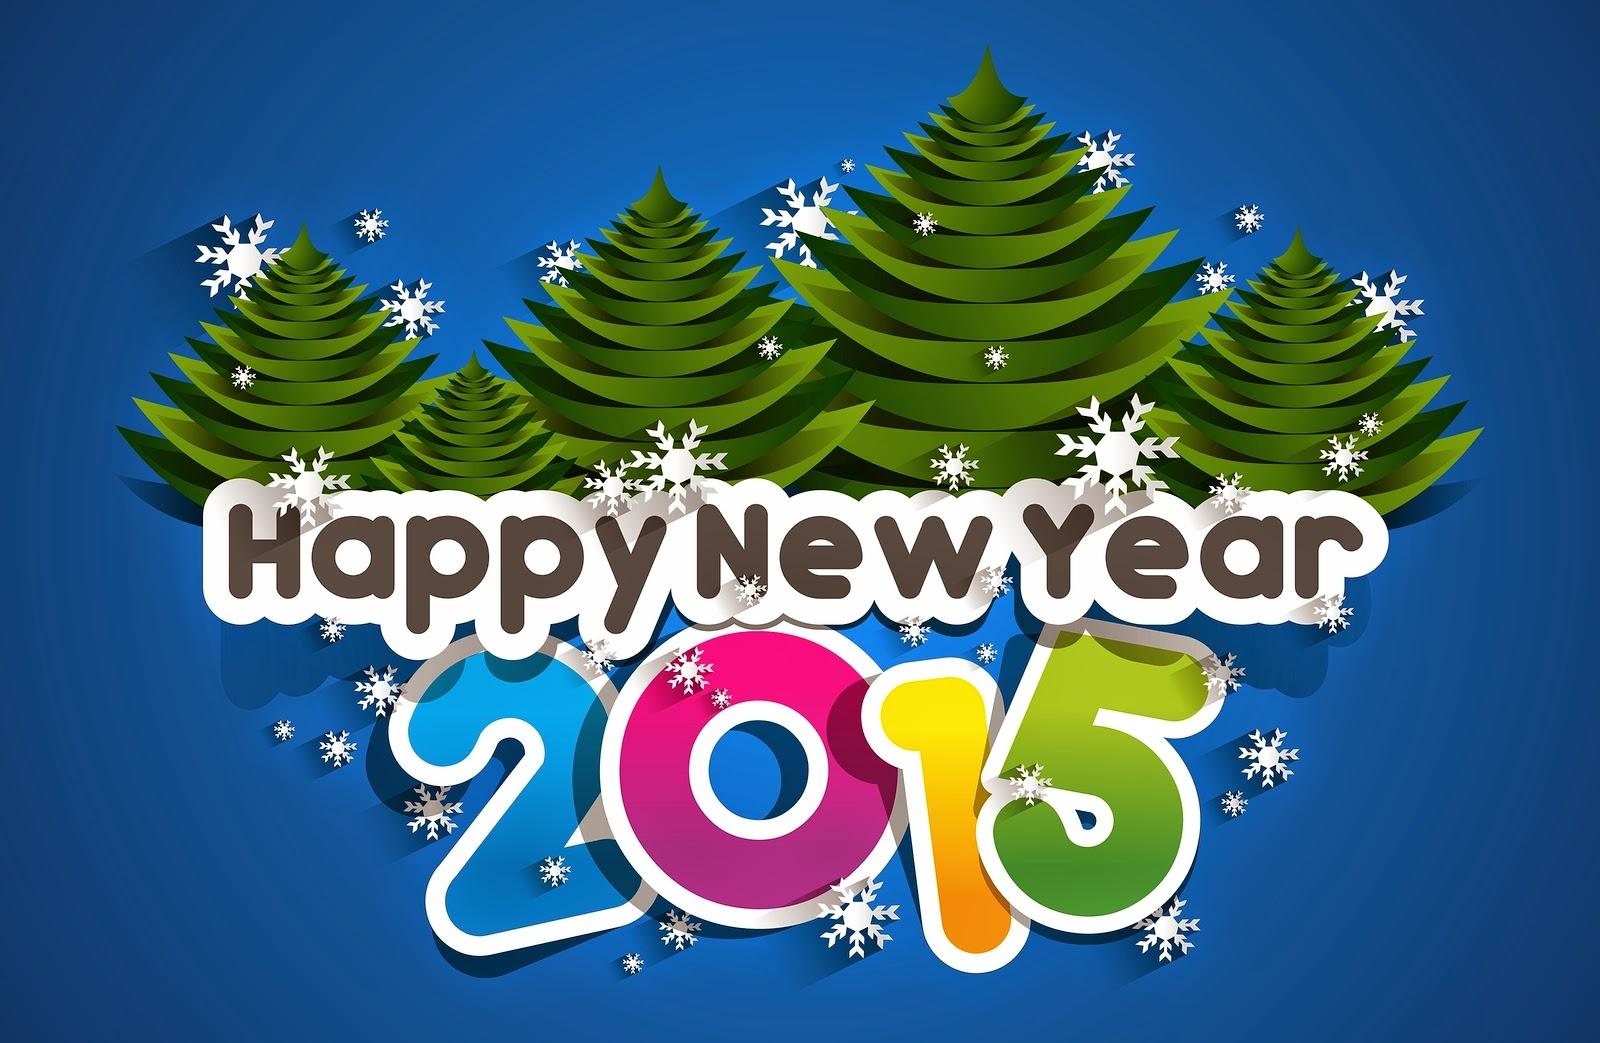 2015 Happy New Year Wallpaper 1600x1043